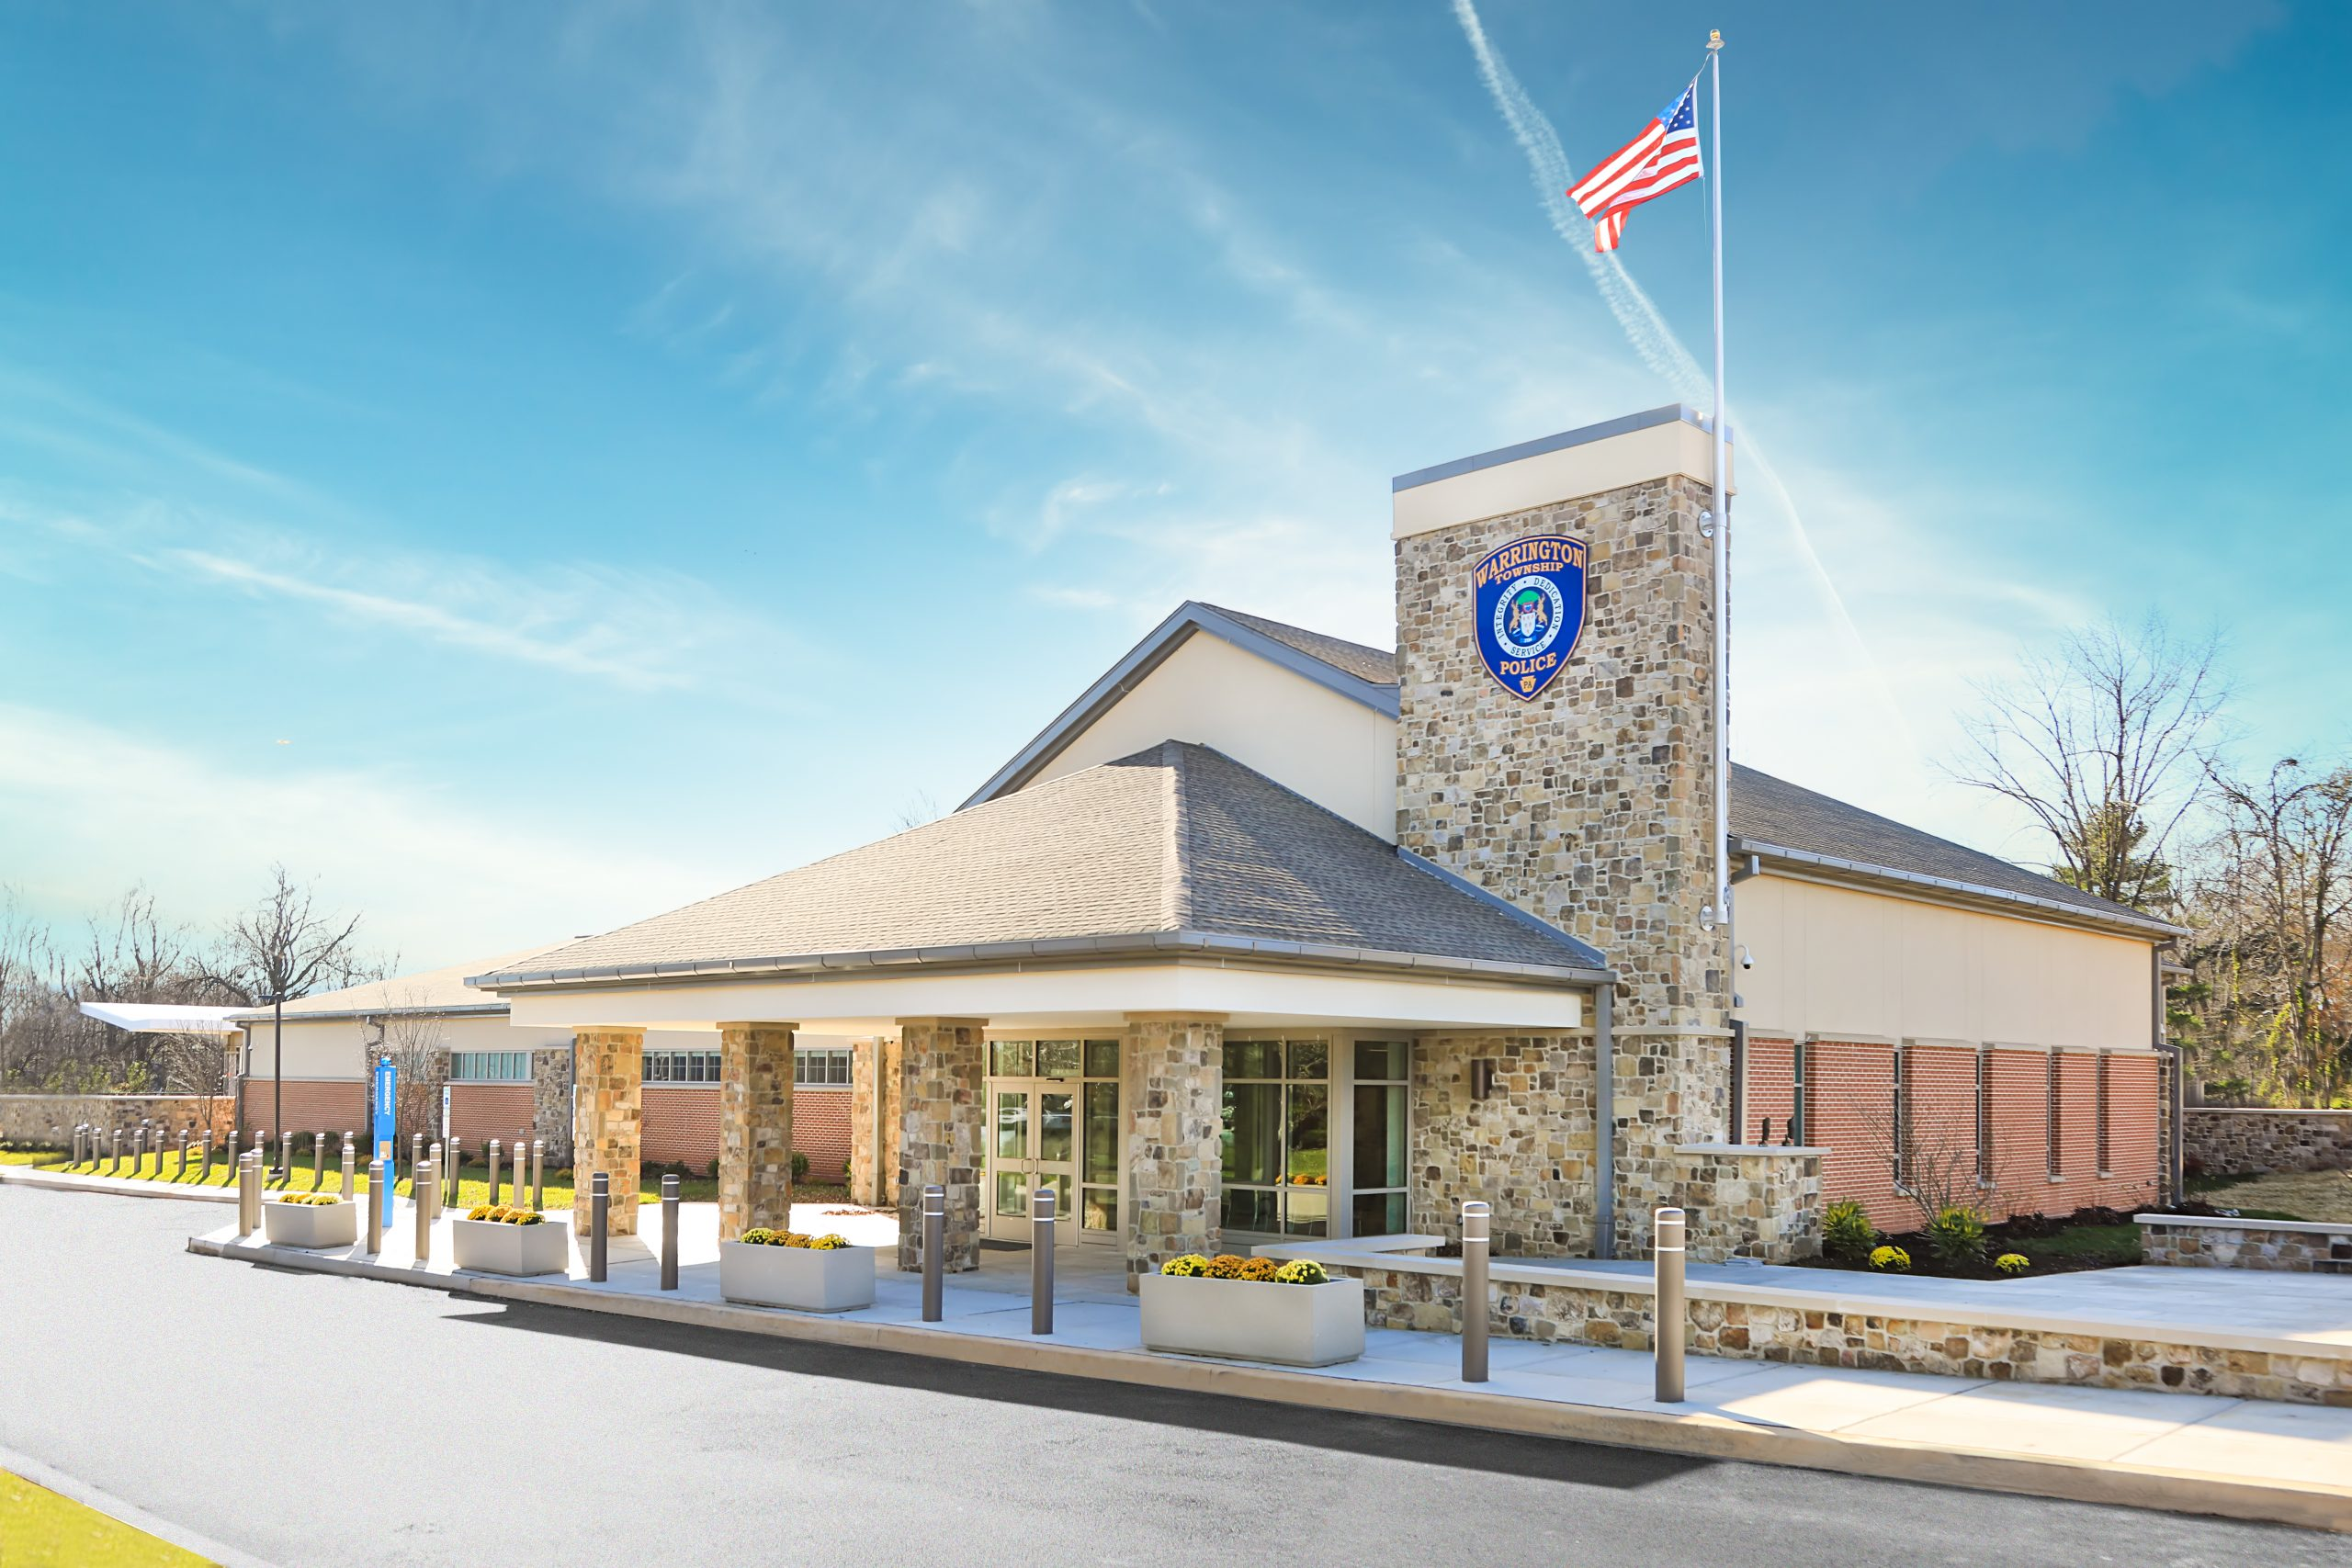 Police Station, Warrington, PA